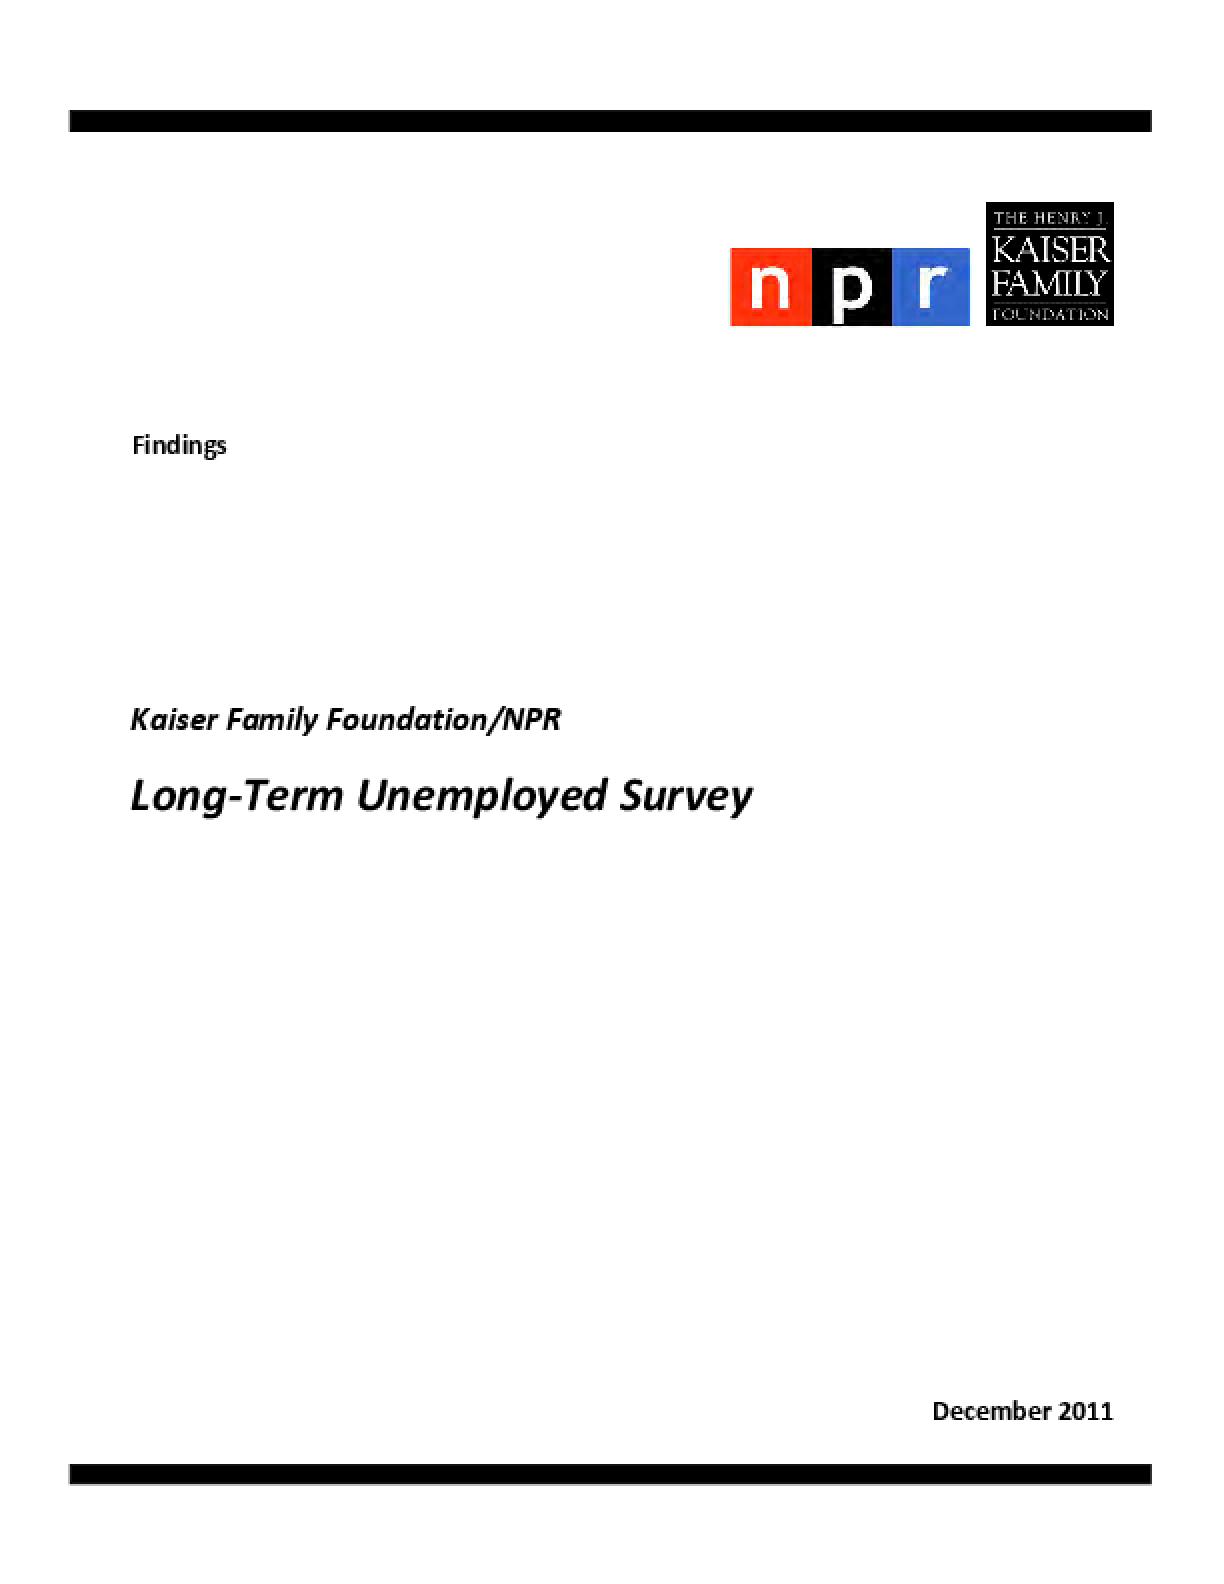 Long-Term Unemployed Survey